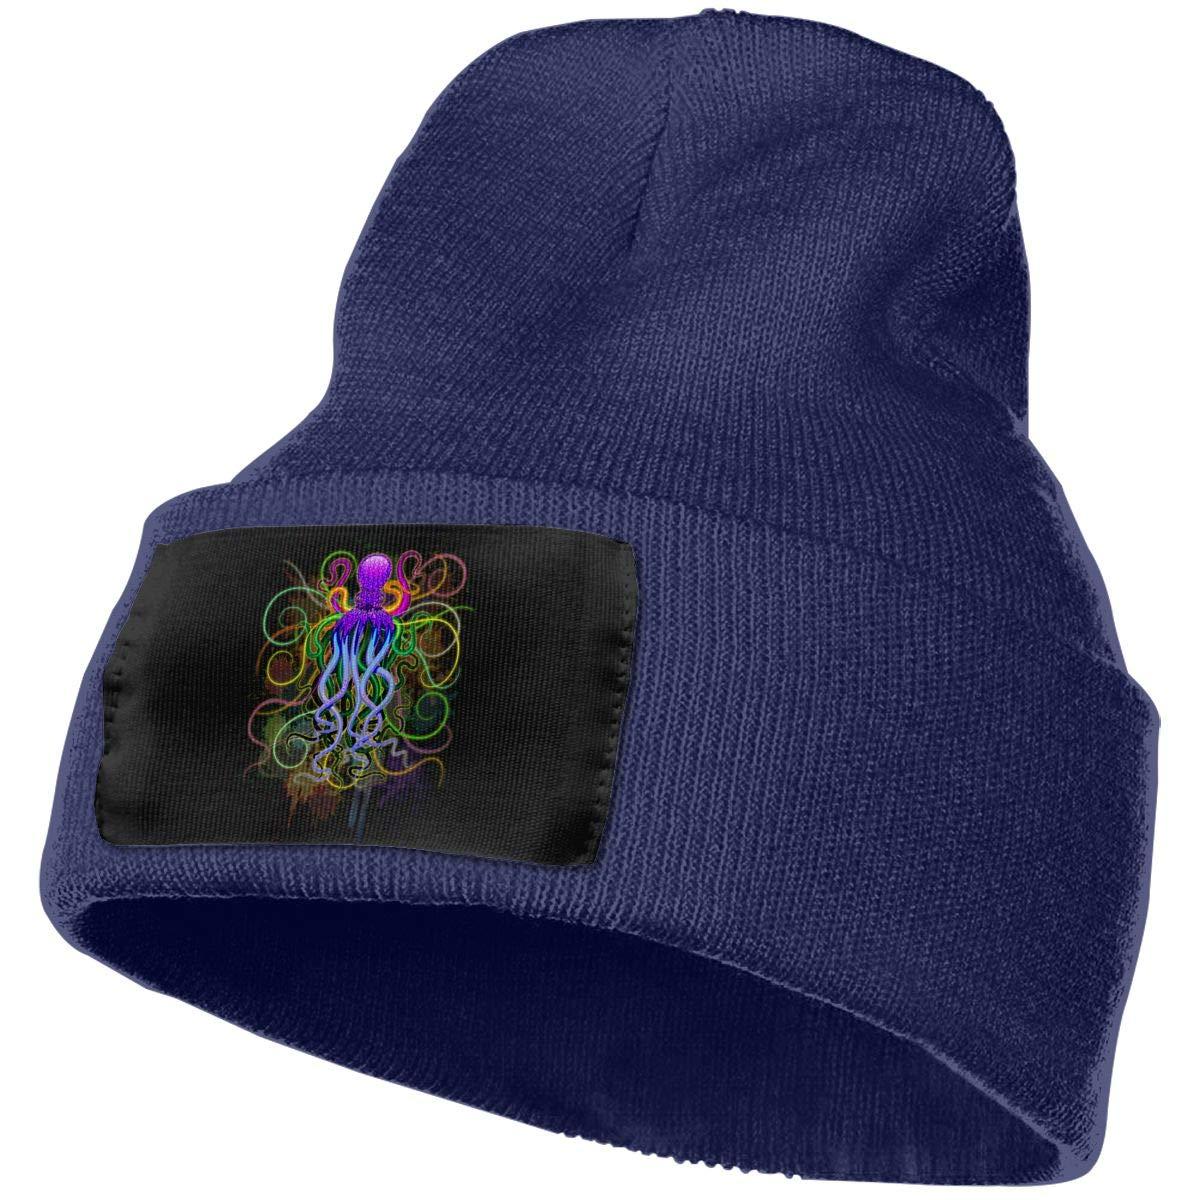 SLADDD1 Octopus Psychedelic Luminescence Warm Winter Hat Knit ...